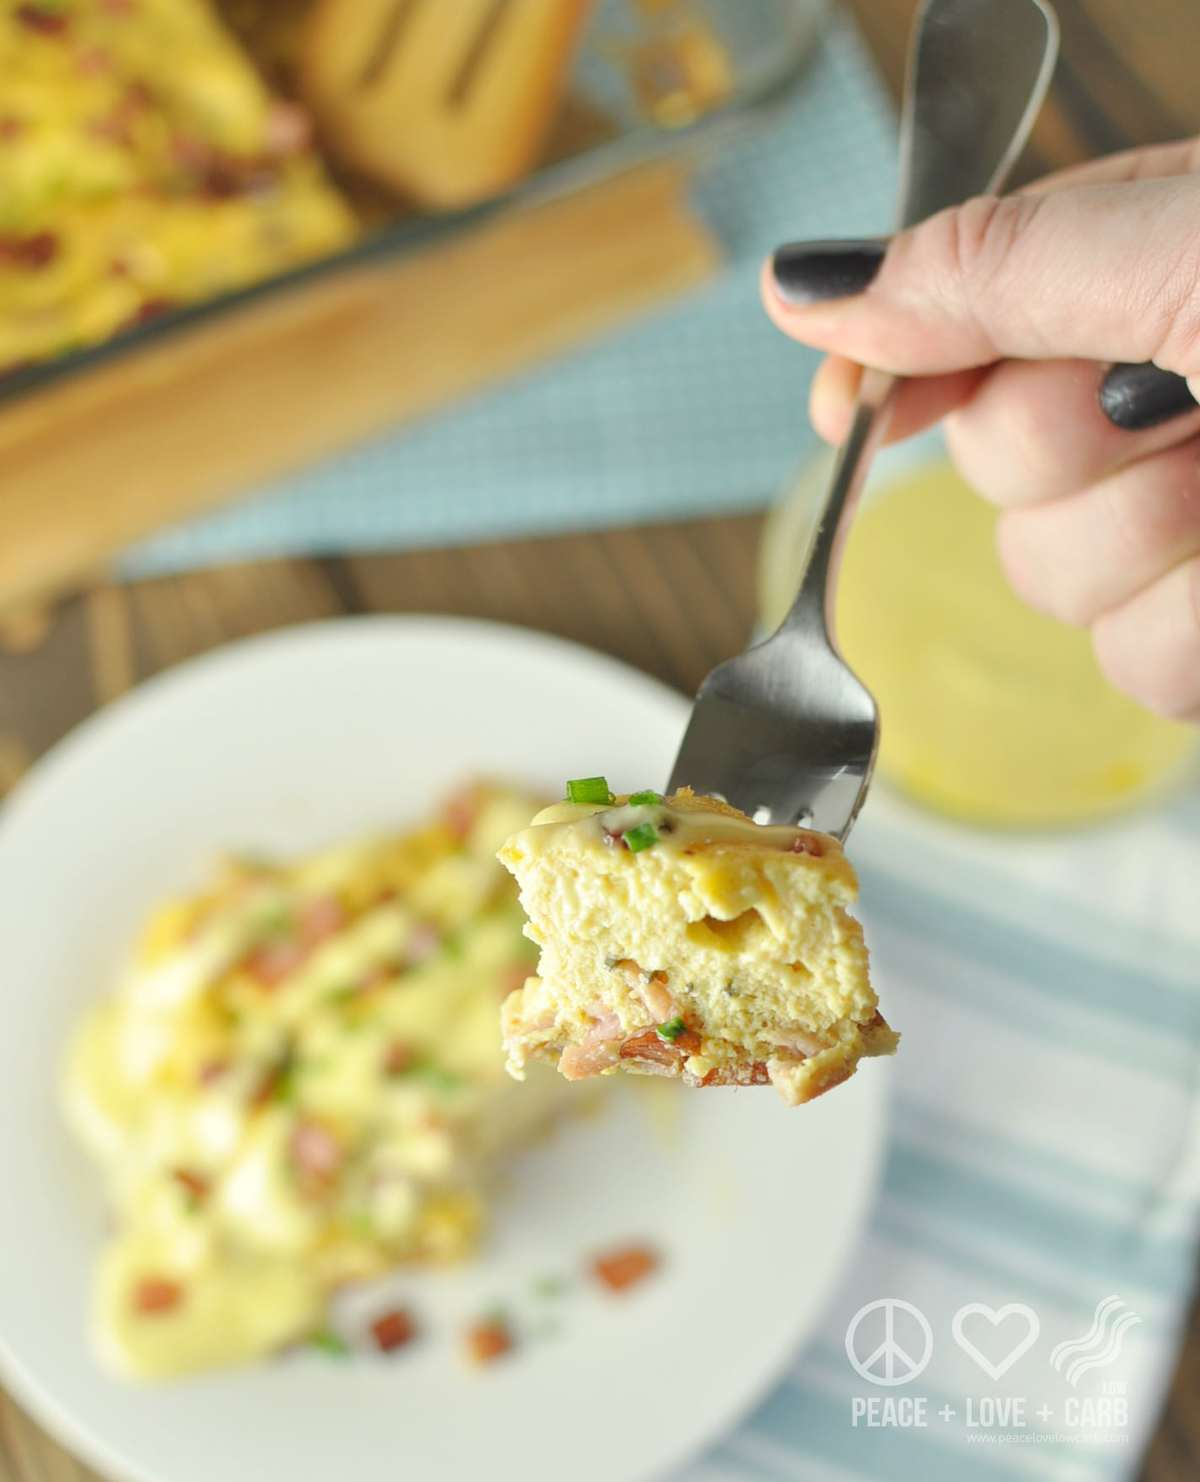 Keto Eggs Benedict Casserole - Low Carb, Gluten Free